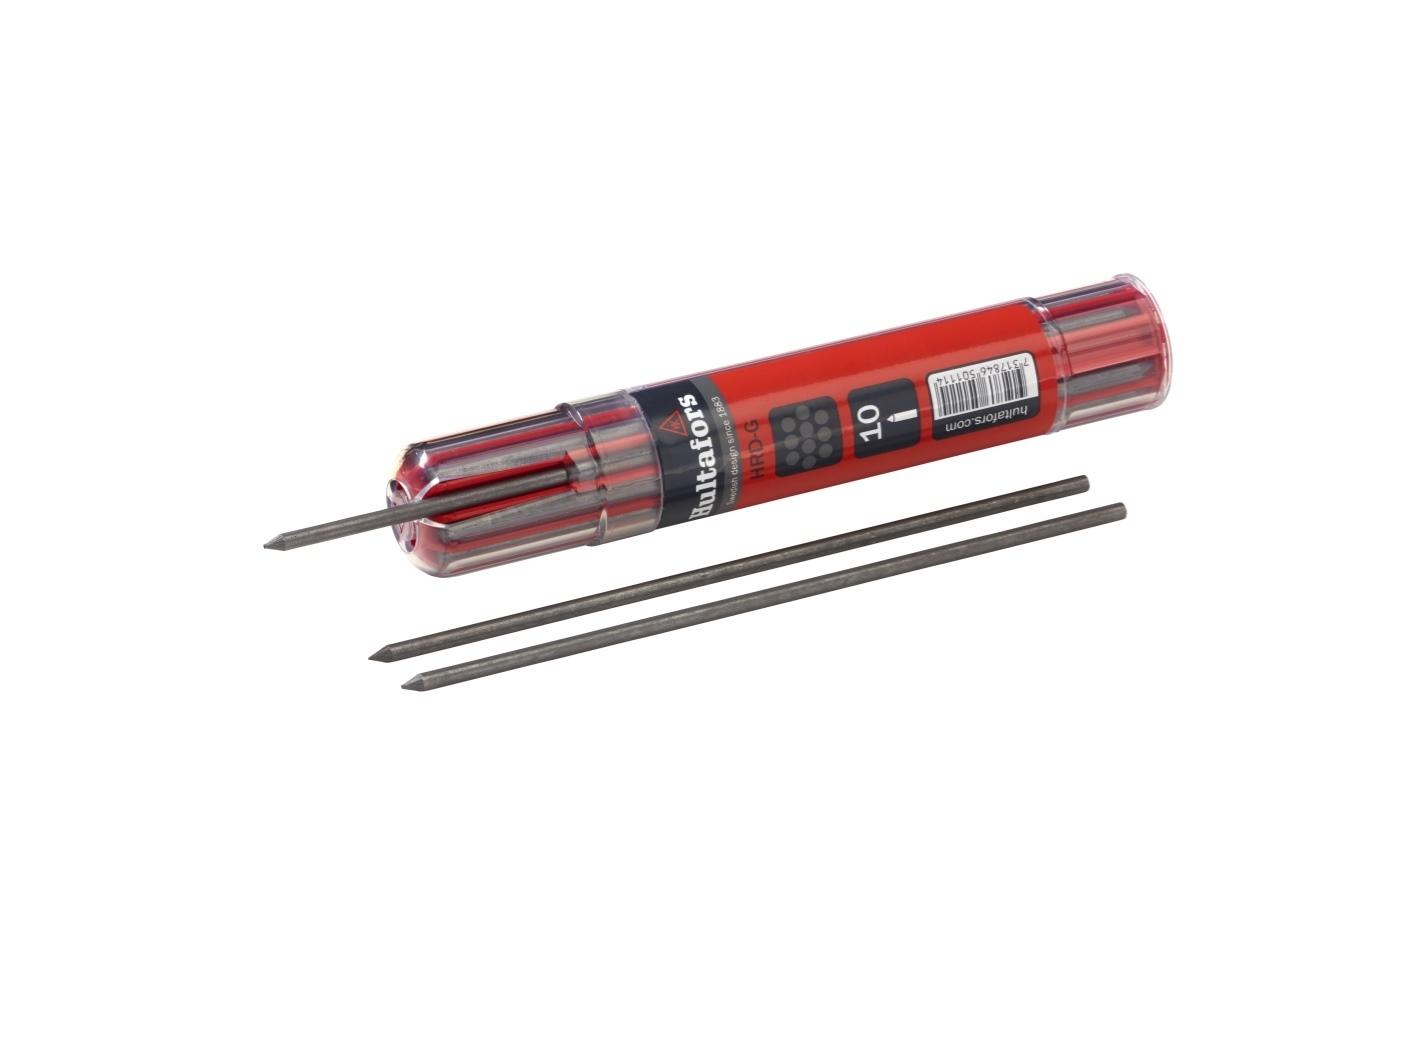 Hultafors Dry Marker Refills—Graphite HU-650110